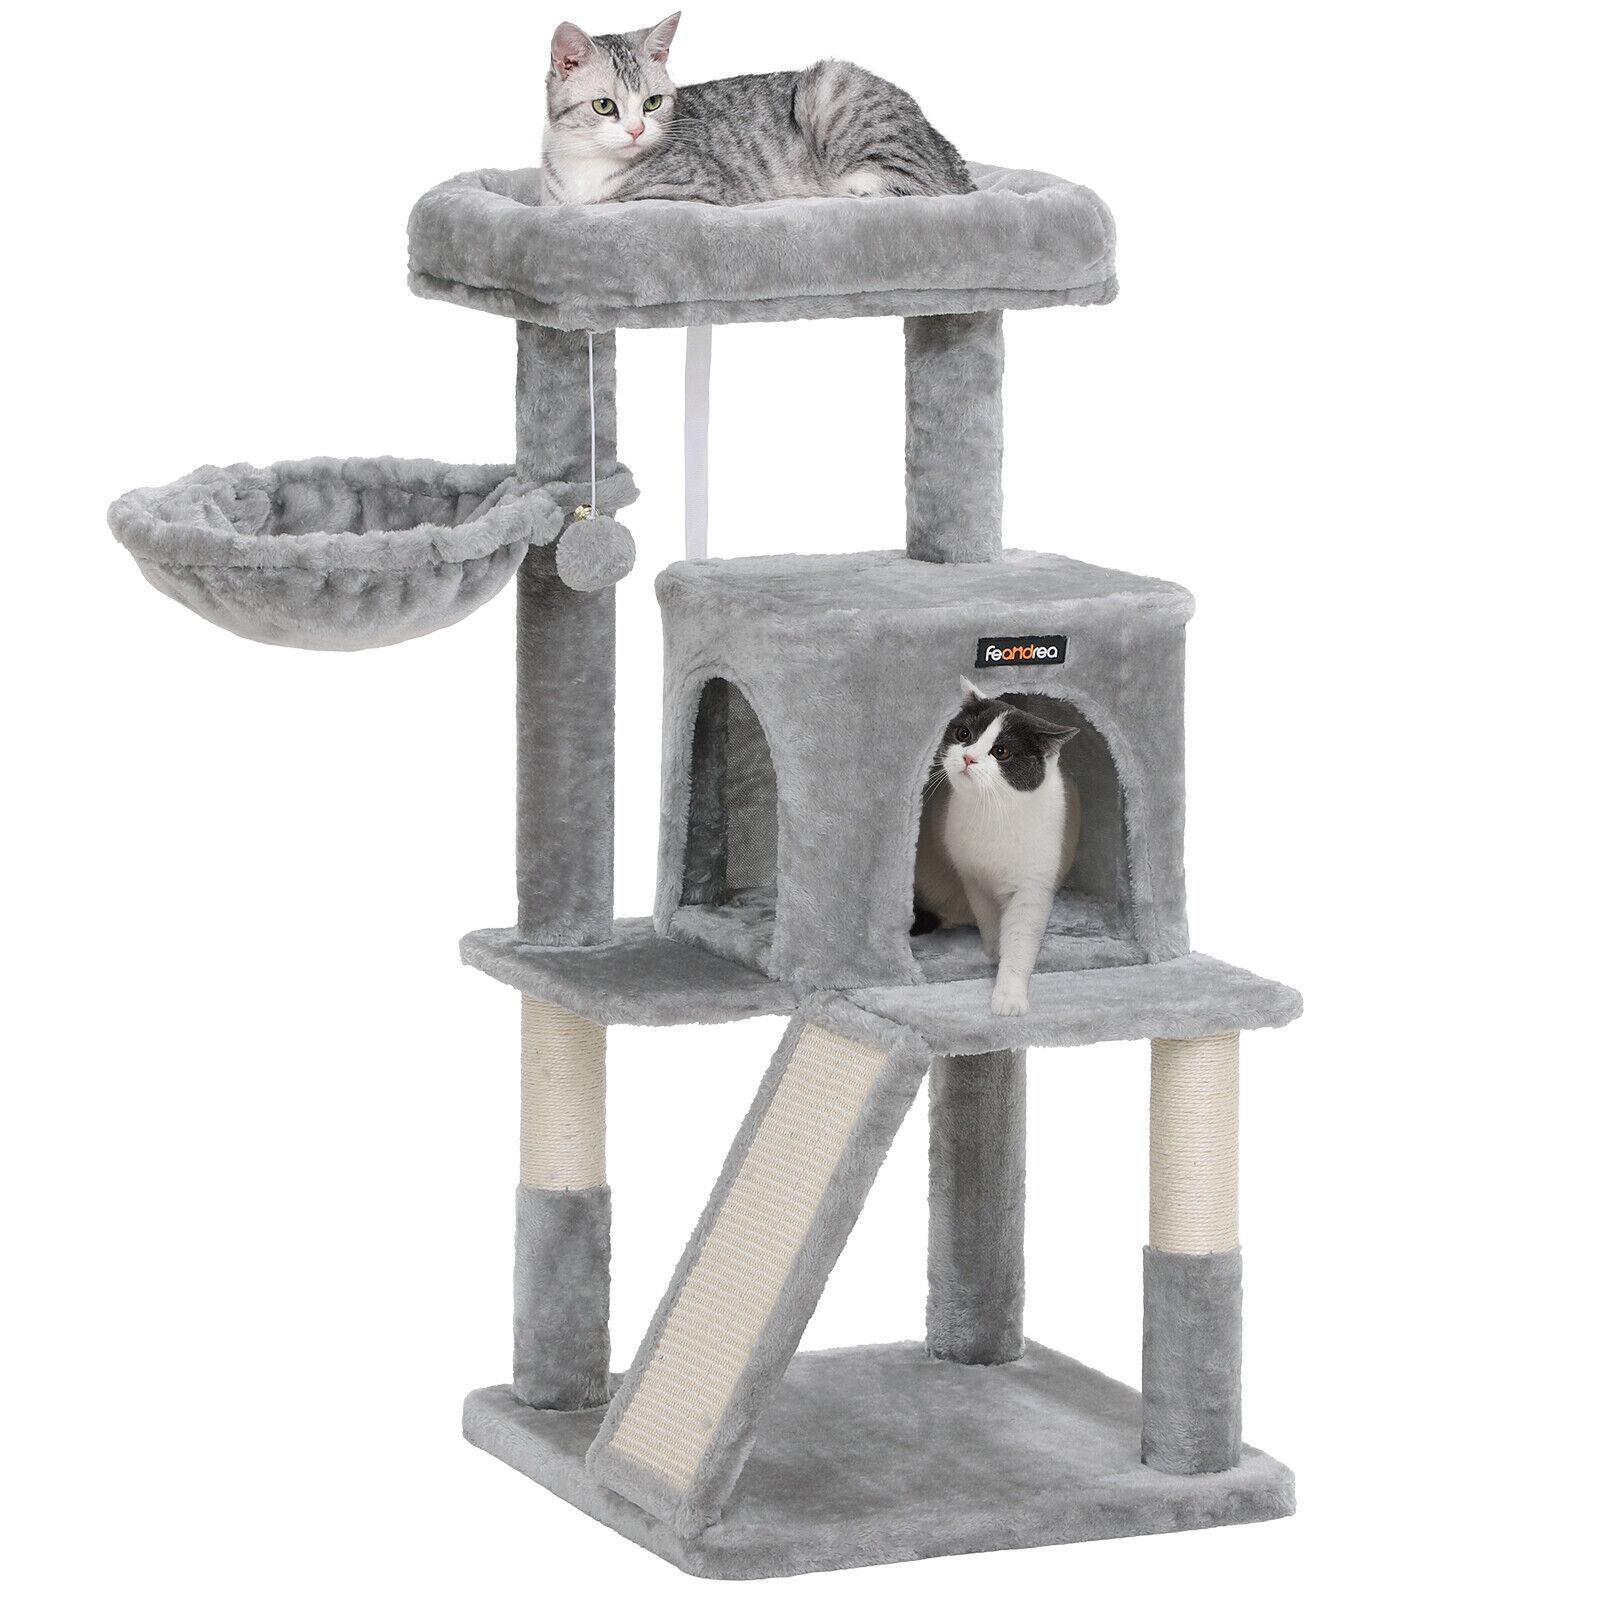 FEANDREA Kratzbaum, Katzenbaum, Kletterturm für Katzen, Kratzbrett, grau PCT51W